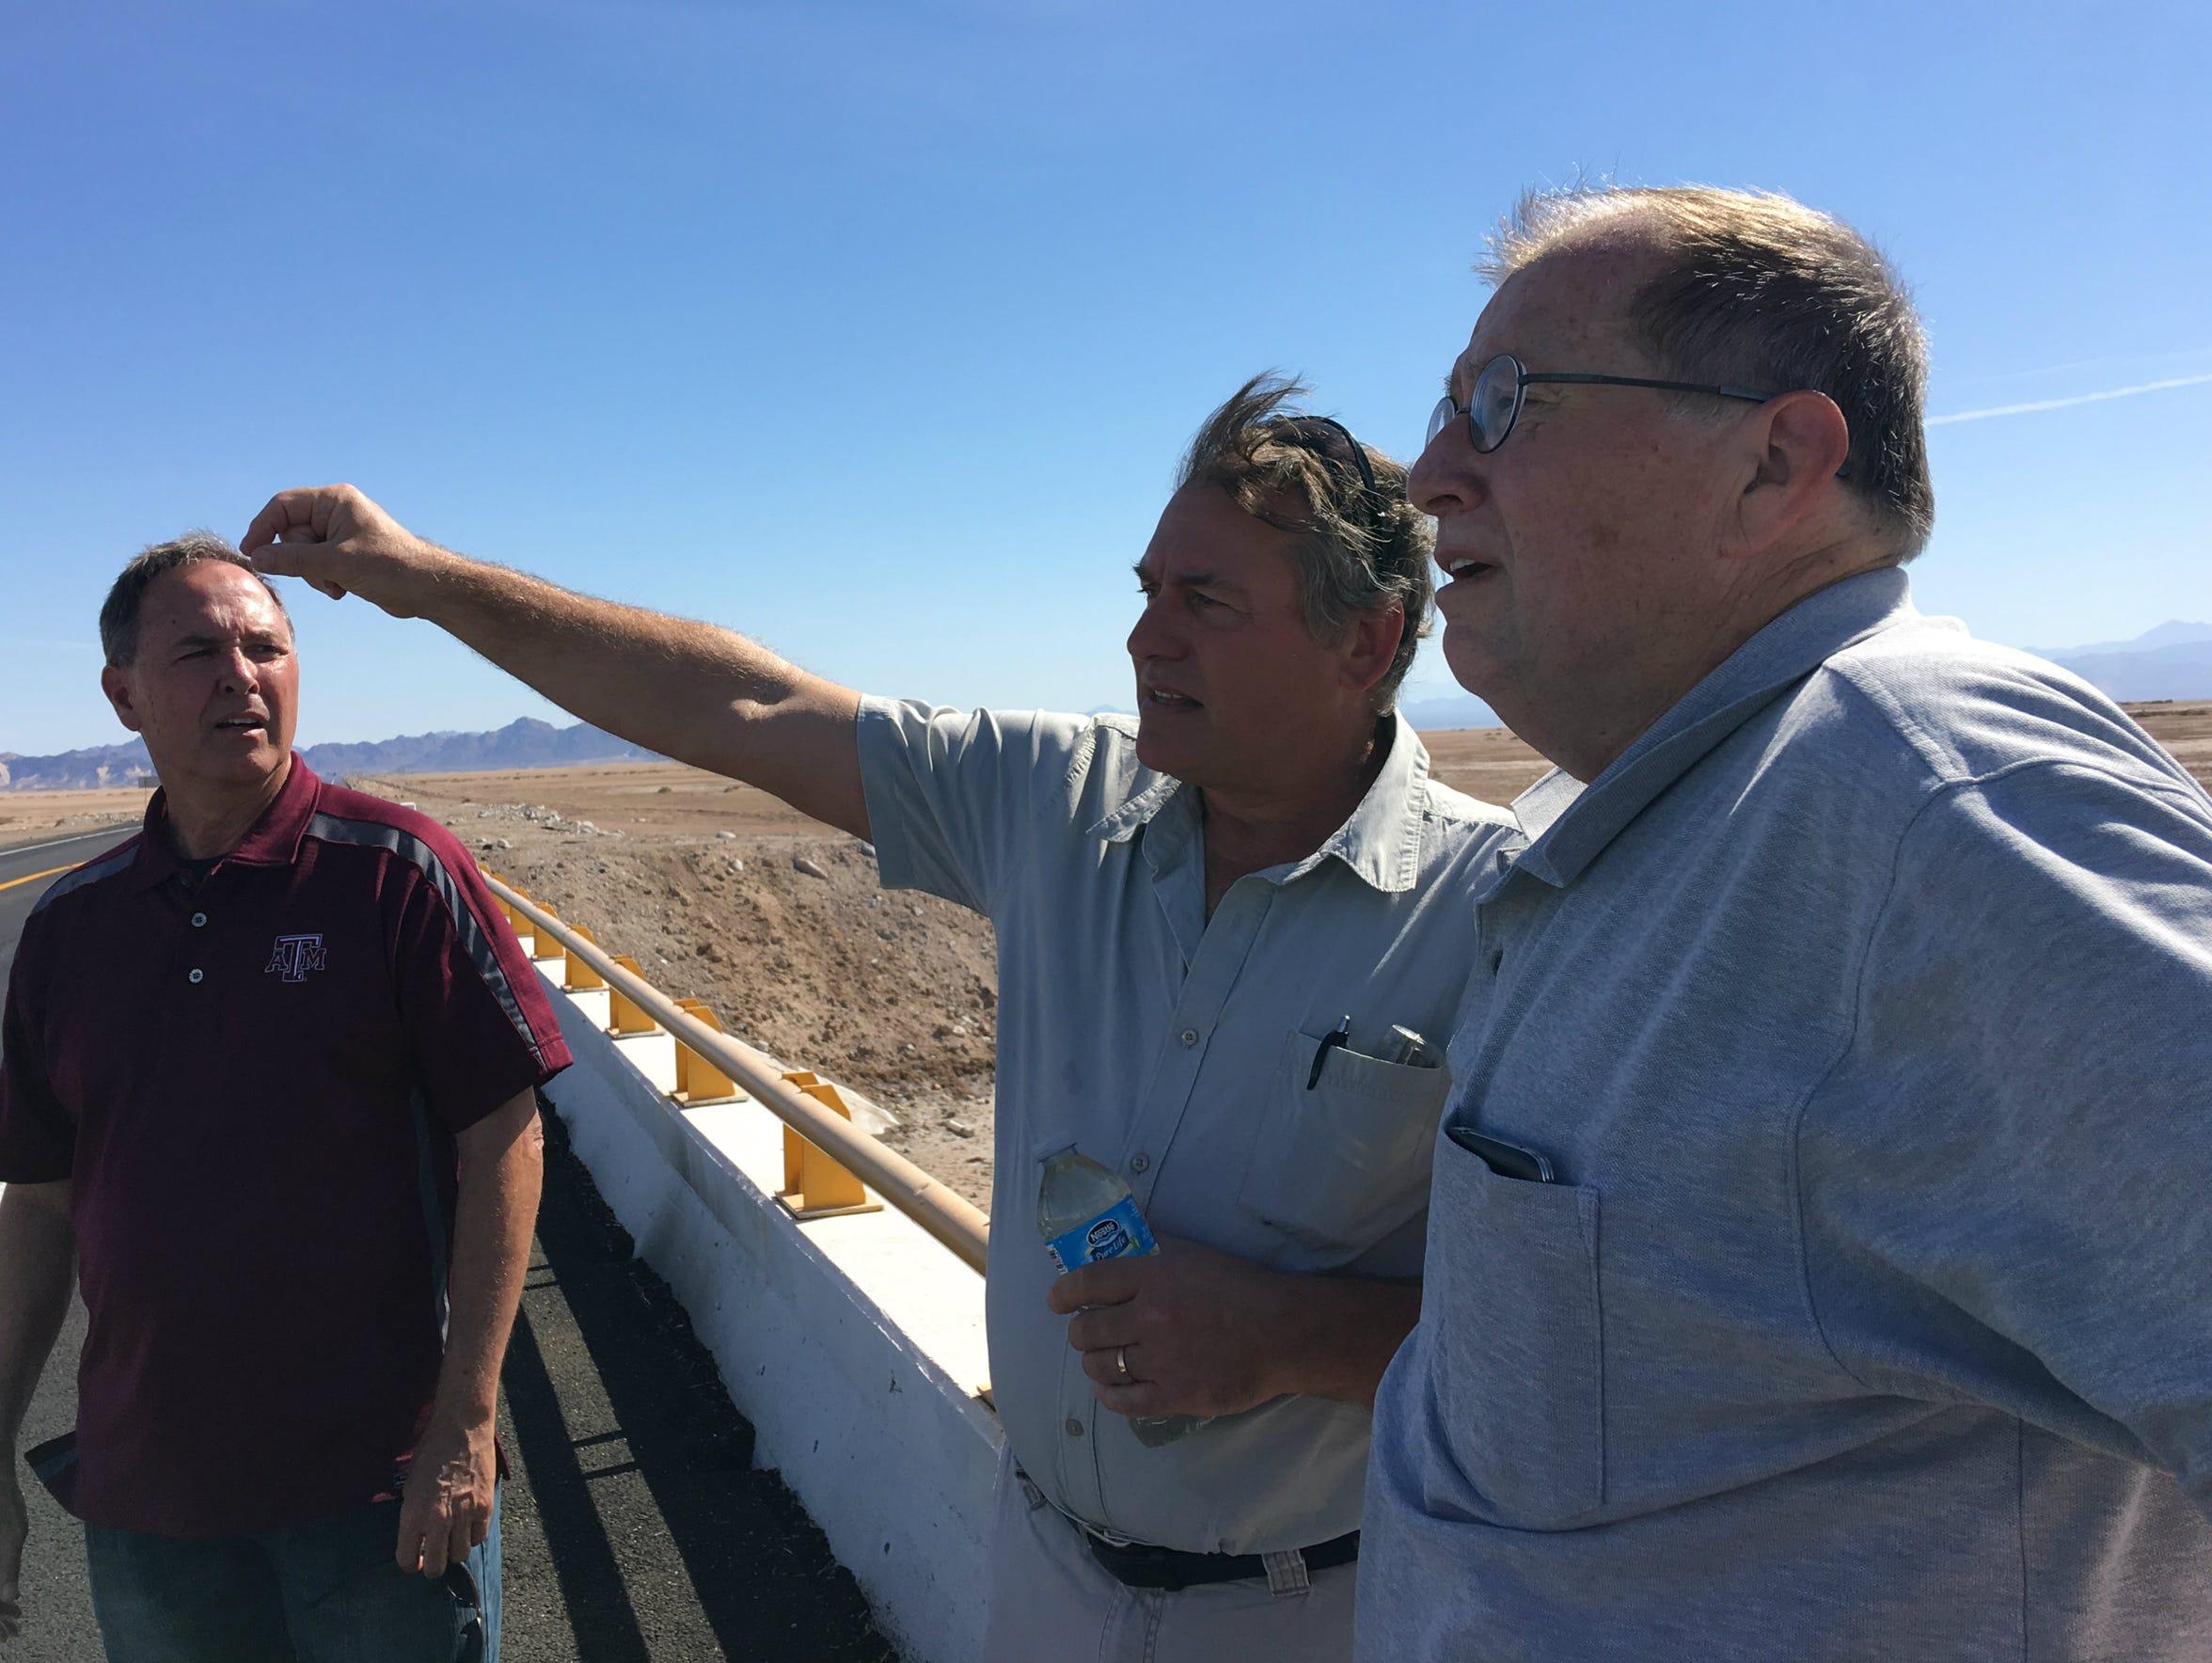 Bruce Wilcox, the assistant secretary for Salton Sea